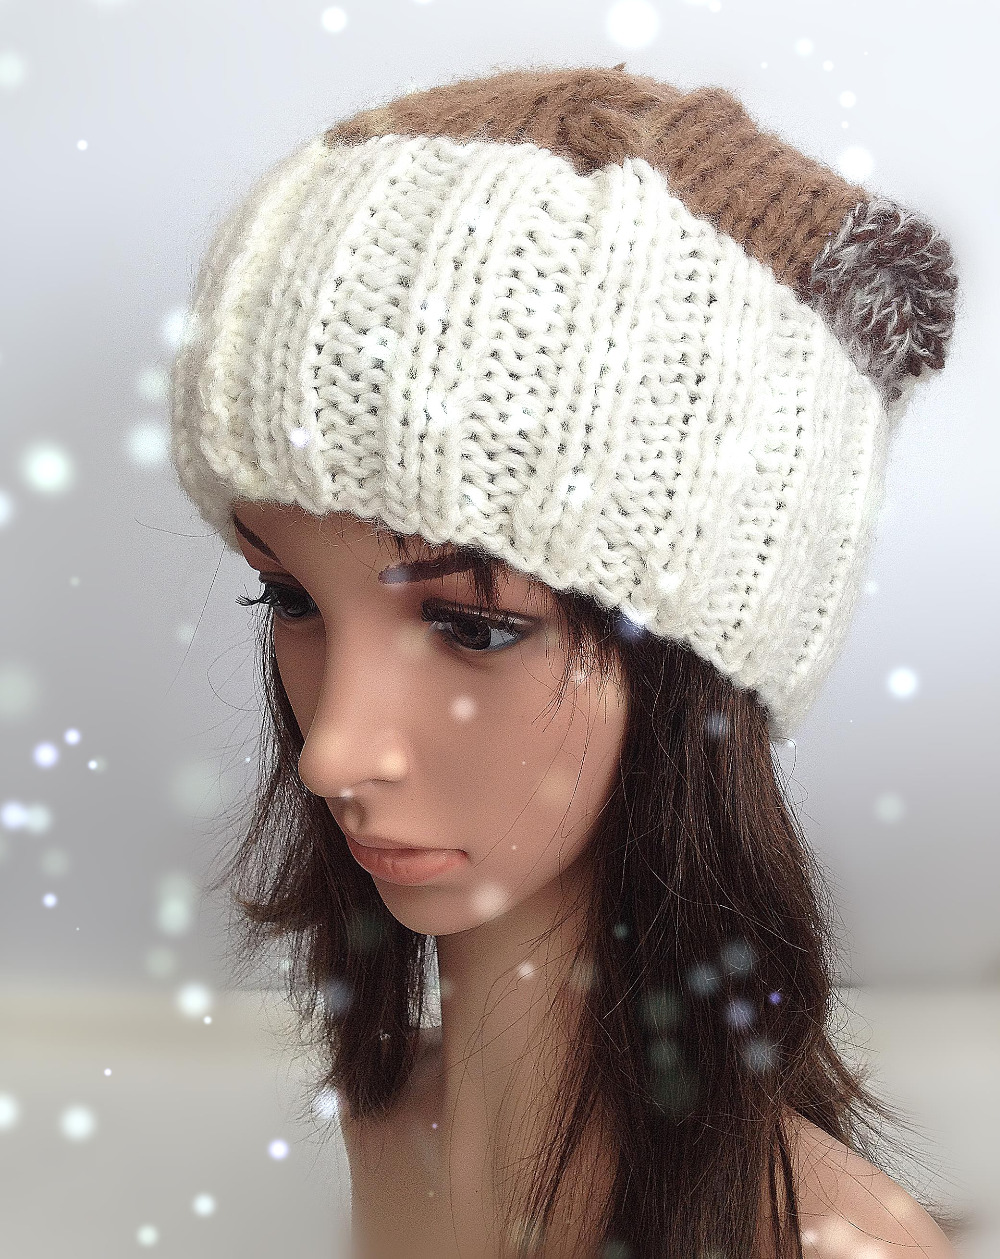 bomhcs cute women s fashion autumn winter warm crochet beanie handmade ear muff knitted hat cap with letters BomHCS Cute Fashion Women Autumn Winter Warm Knitted Beanie 100% Handmade Soft Wool Crochet Hat Cap